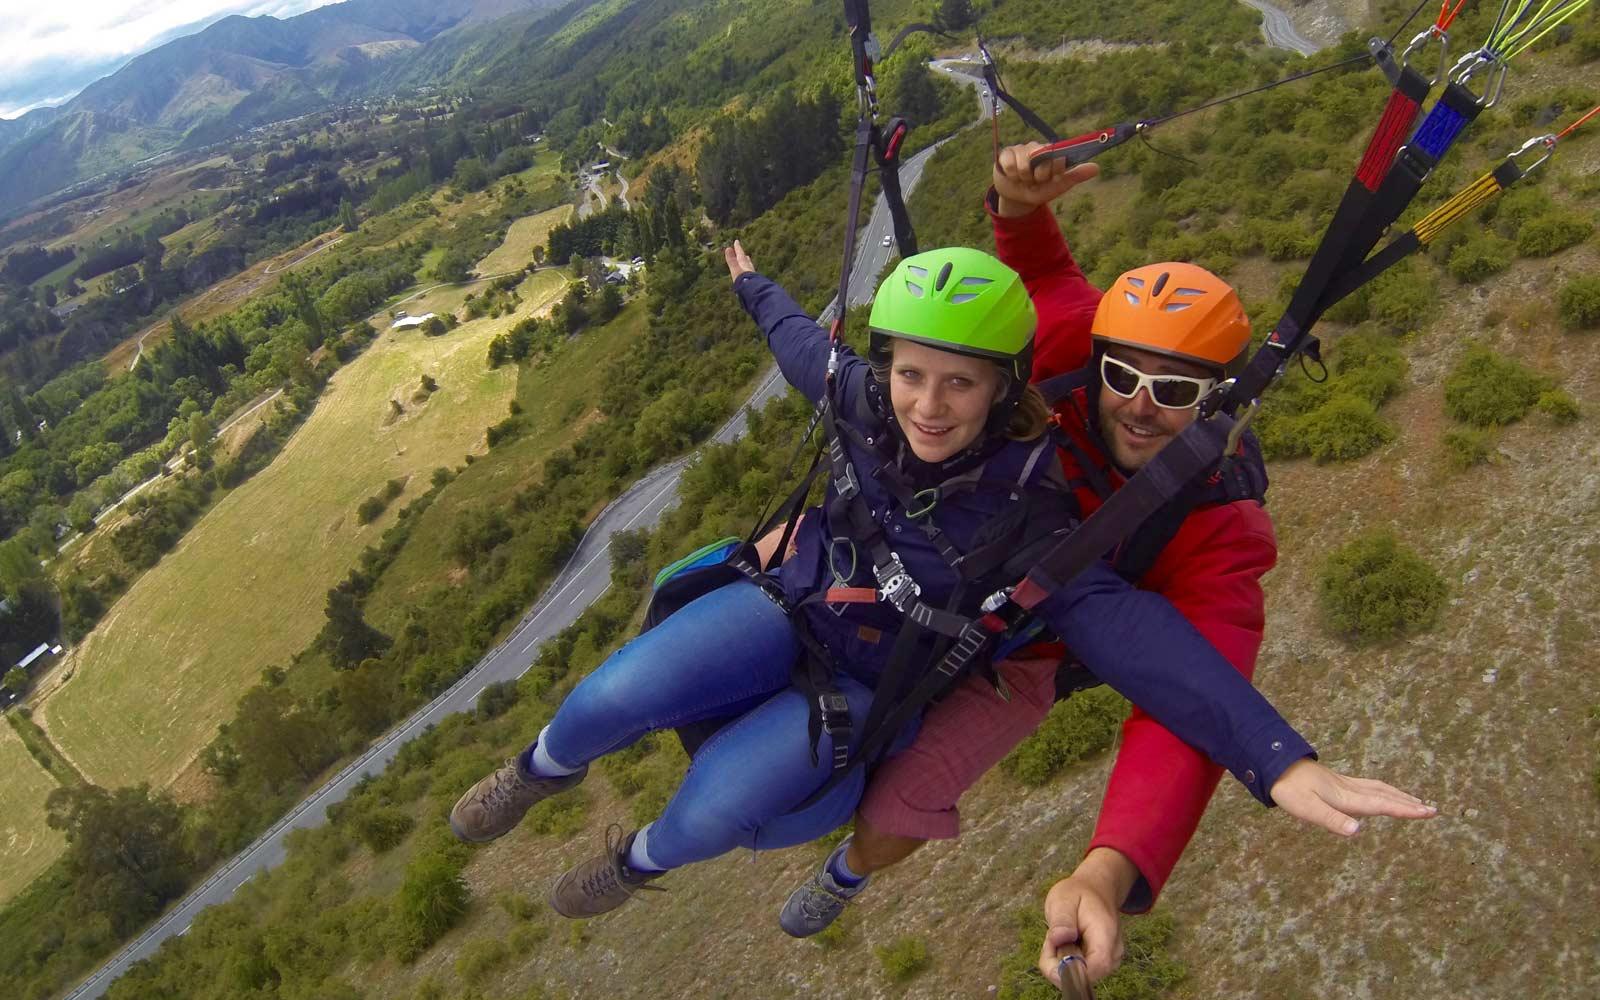 Lena beim Paragliding in Neuseeland